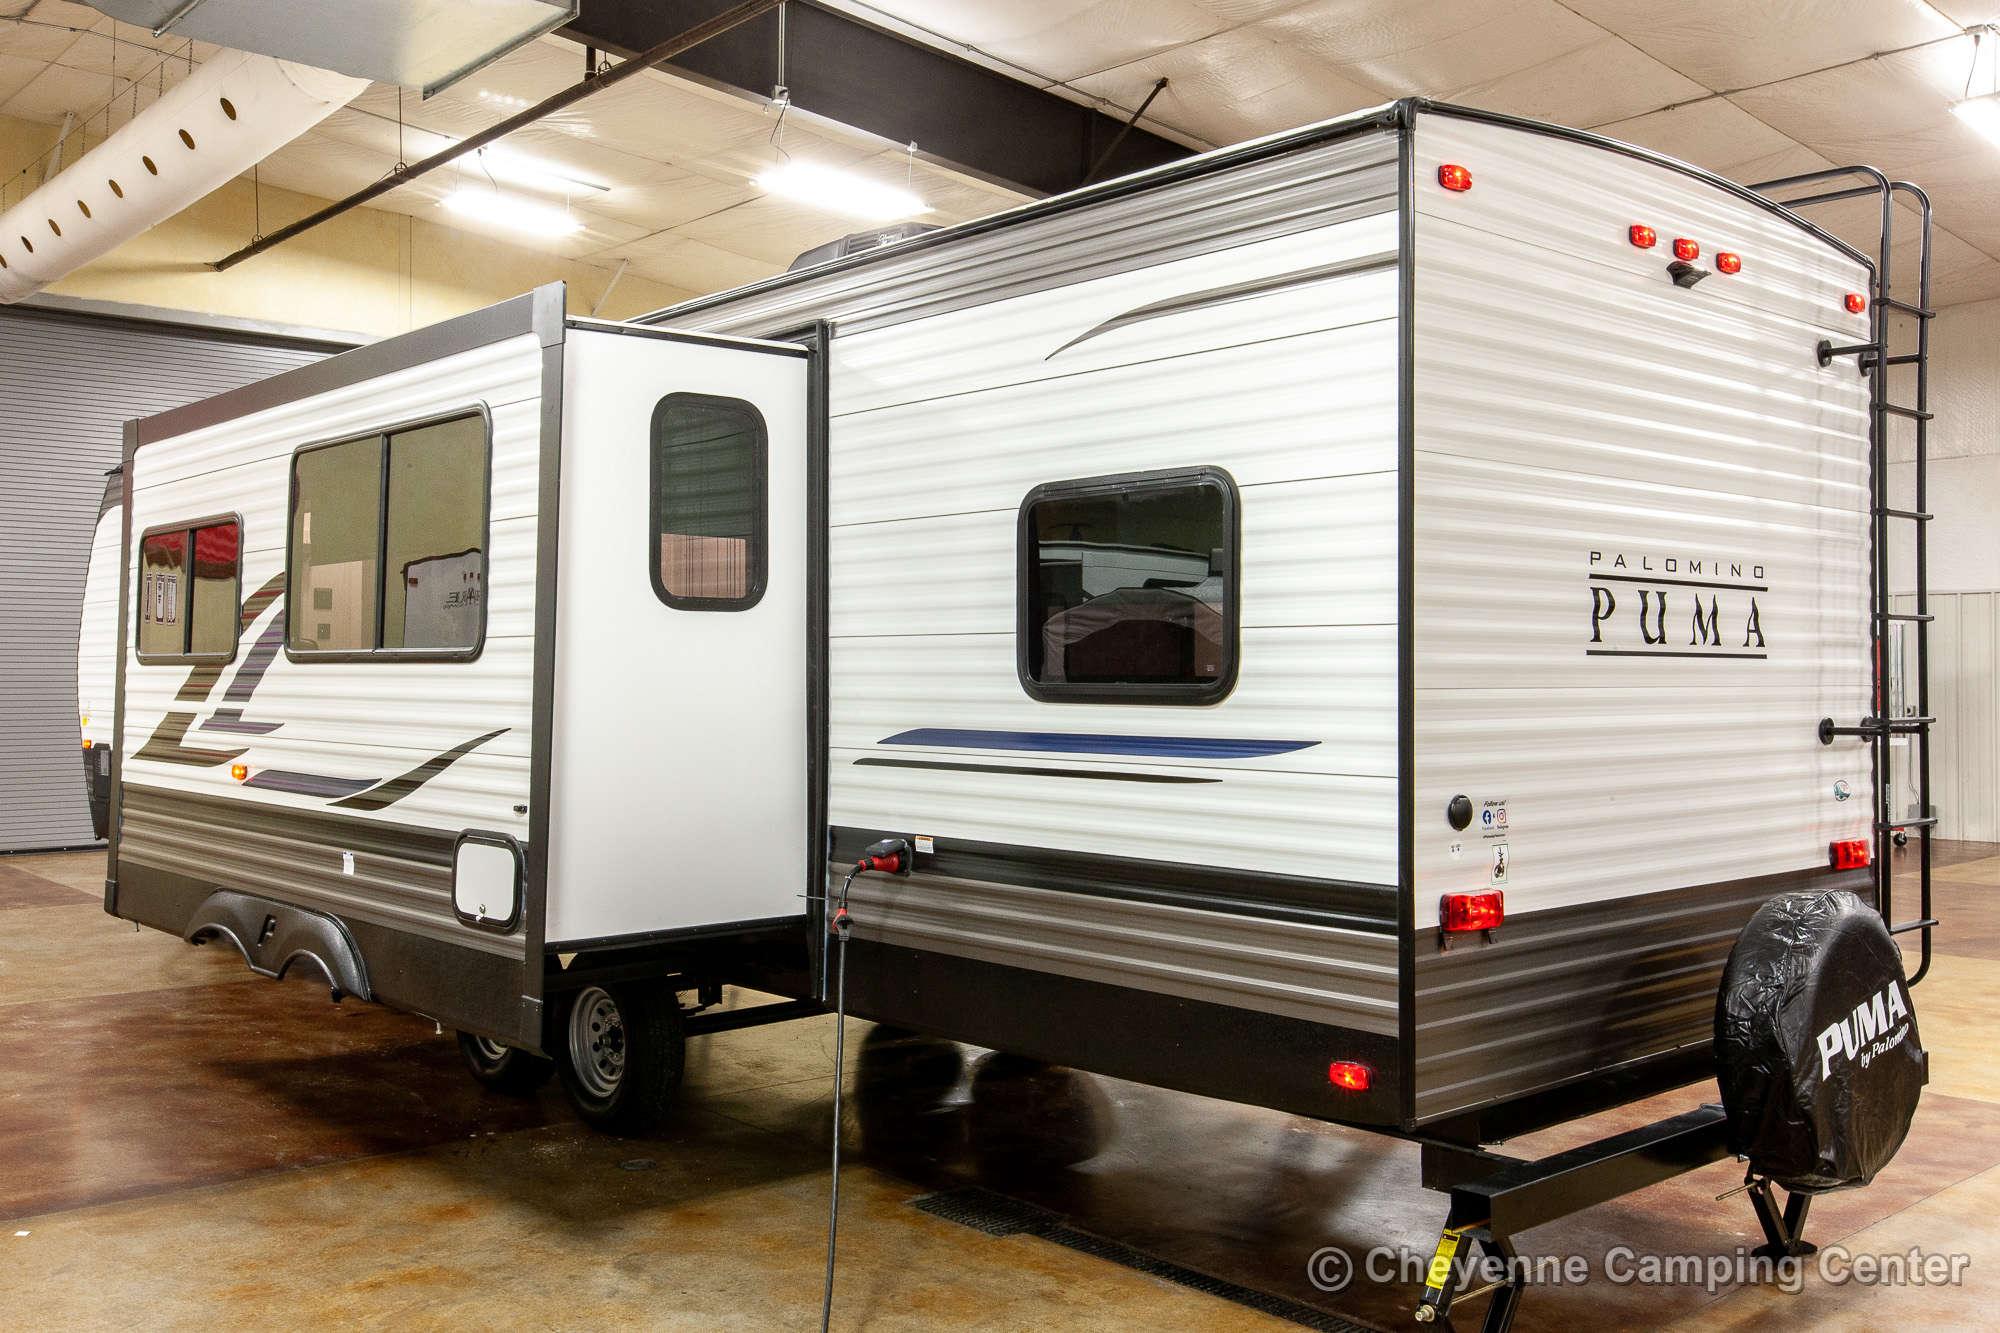 2021 Palomino Puma 28BHSS Bunkhouse Travel Trailer Exterior Image